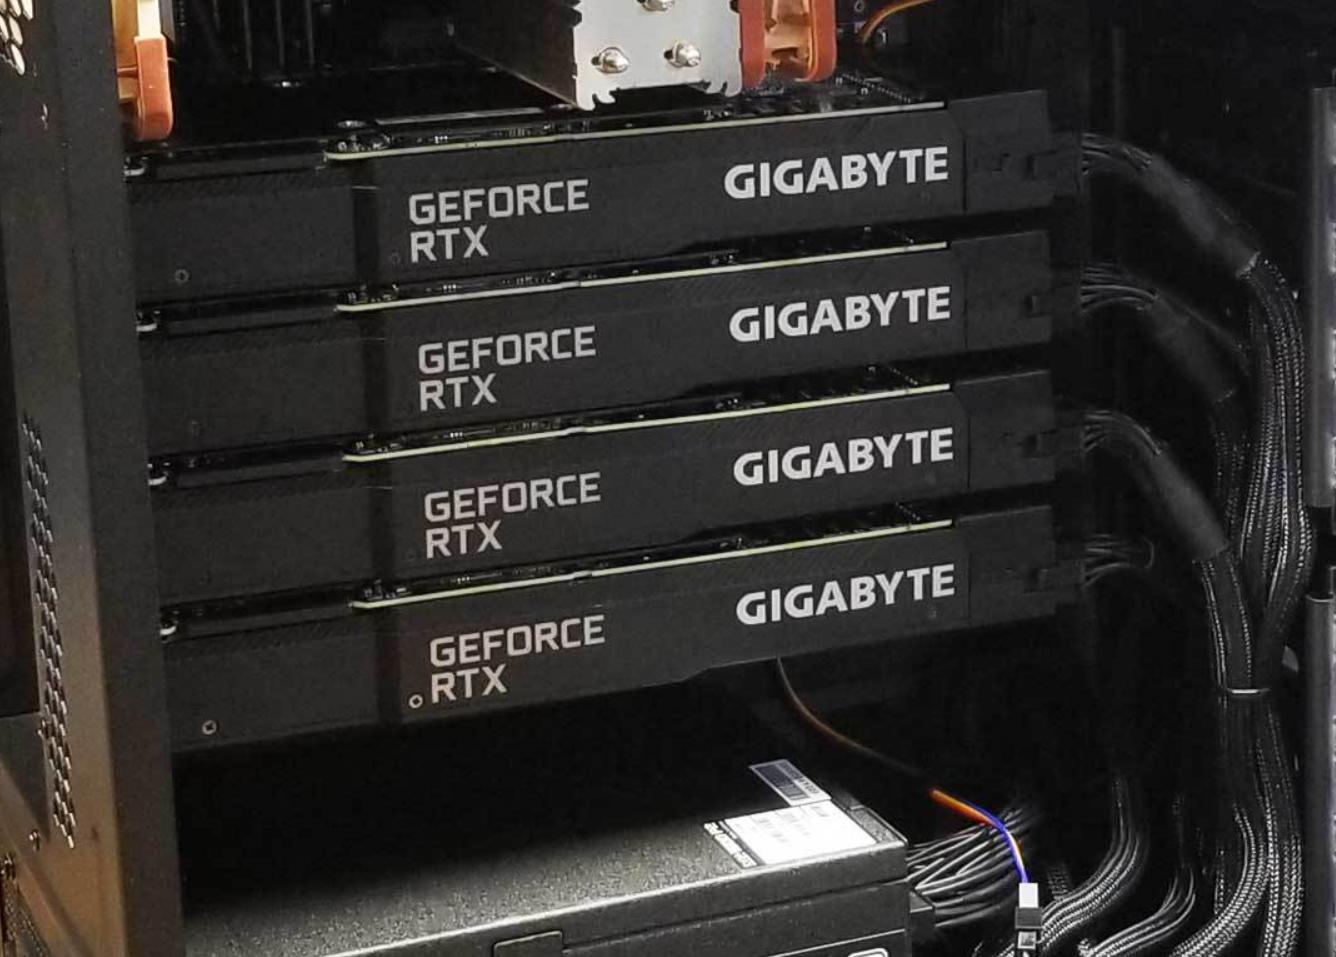 NVIDIA-GeForce-RTX-3090-Four-Way-GPU-Test_Puget-Systems_2